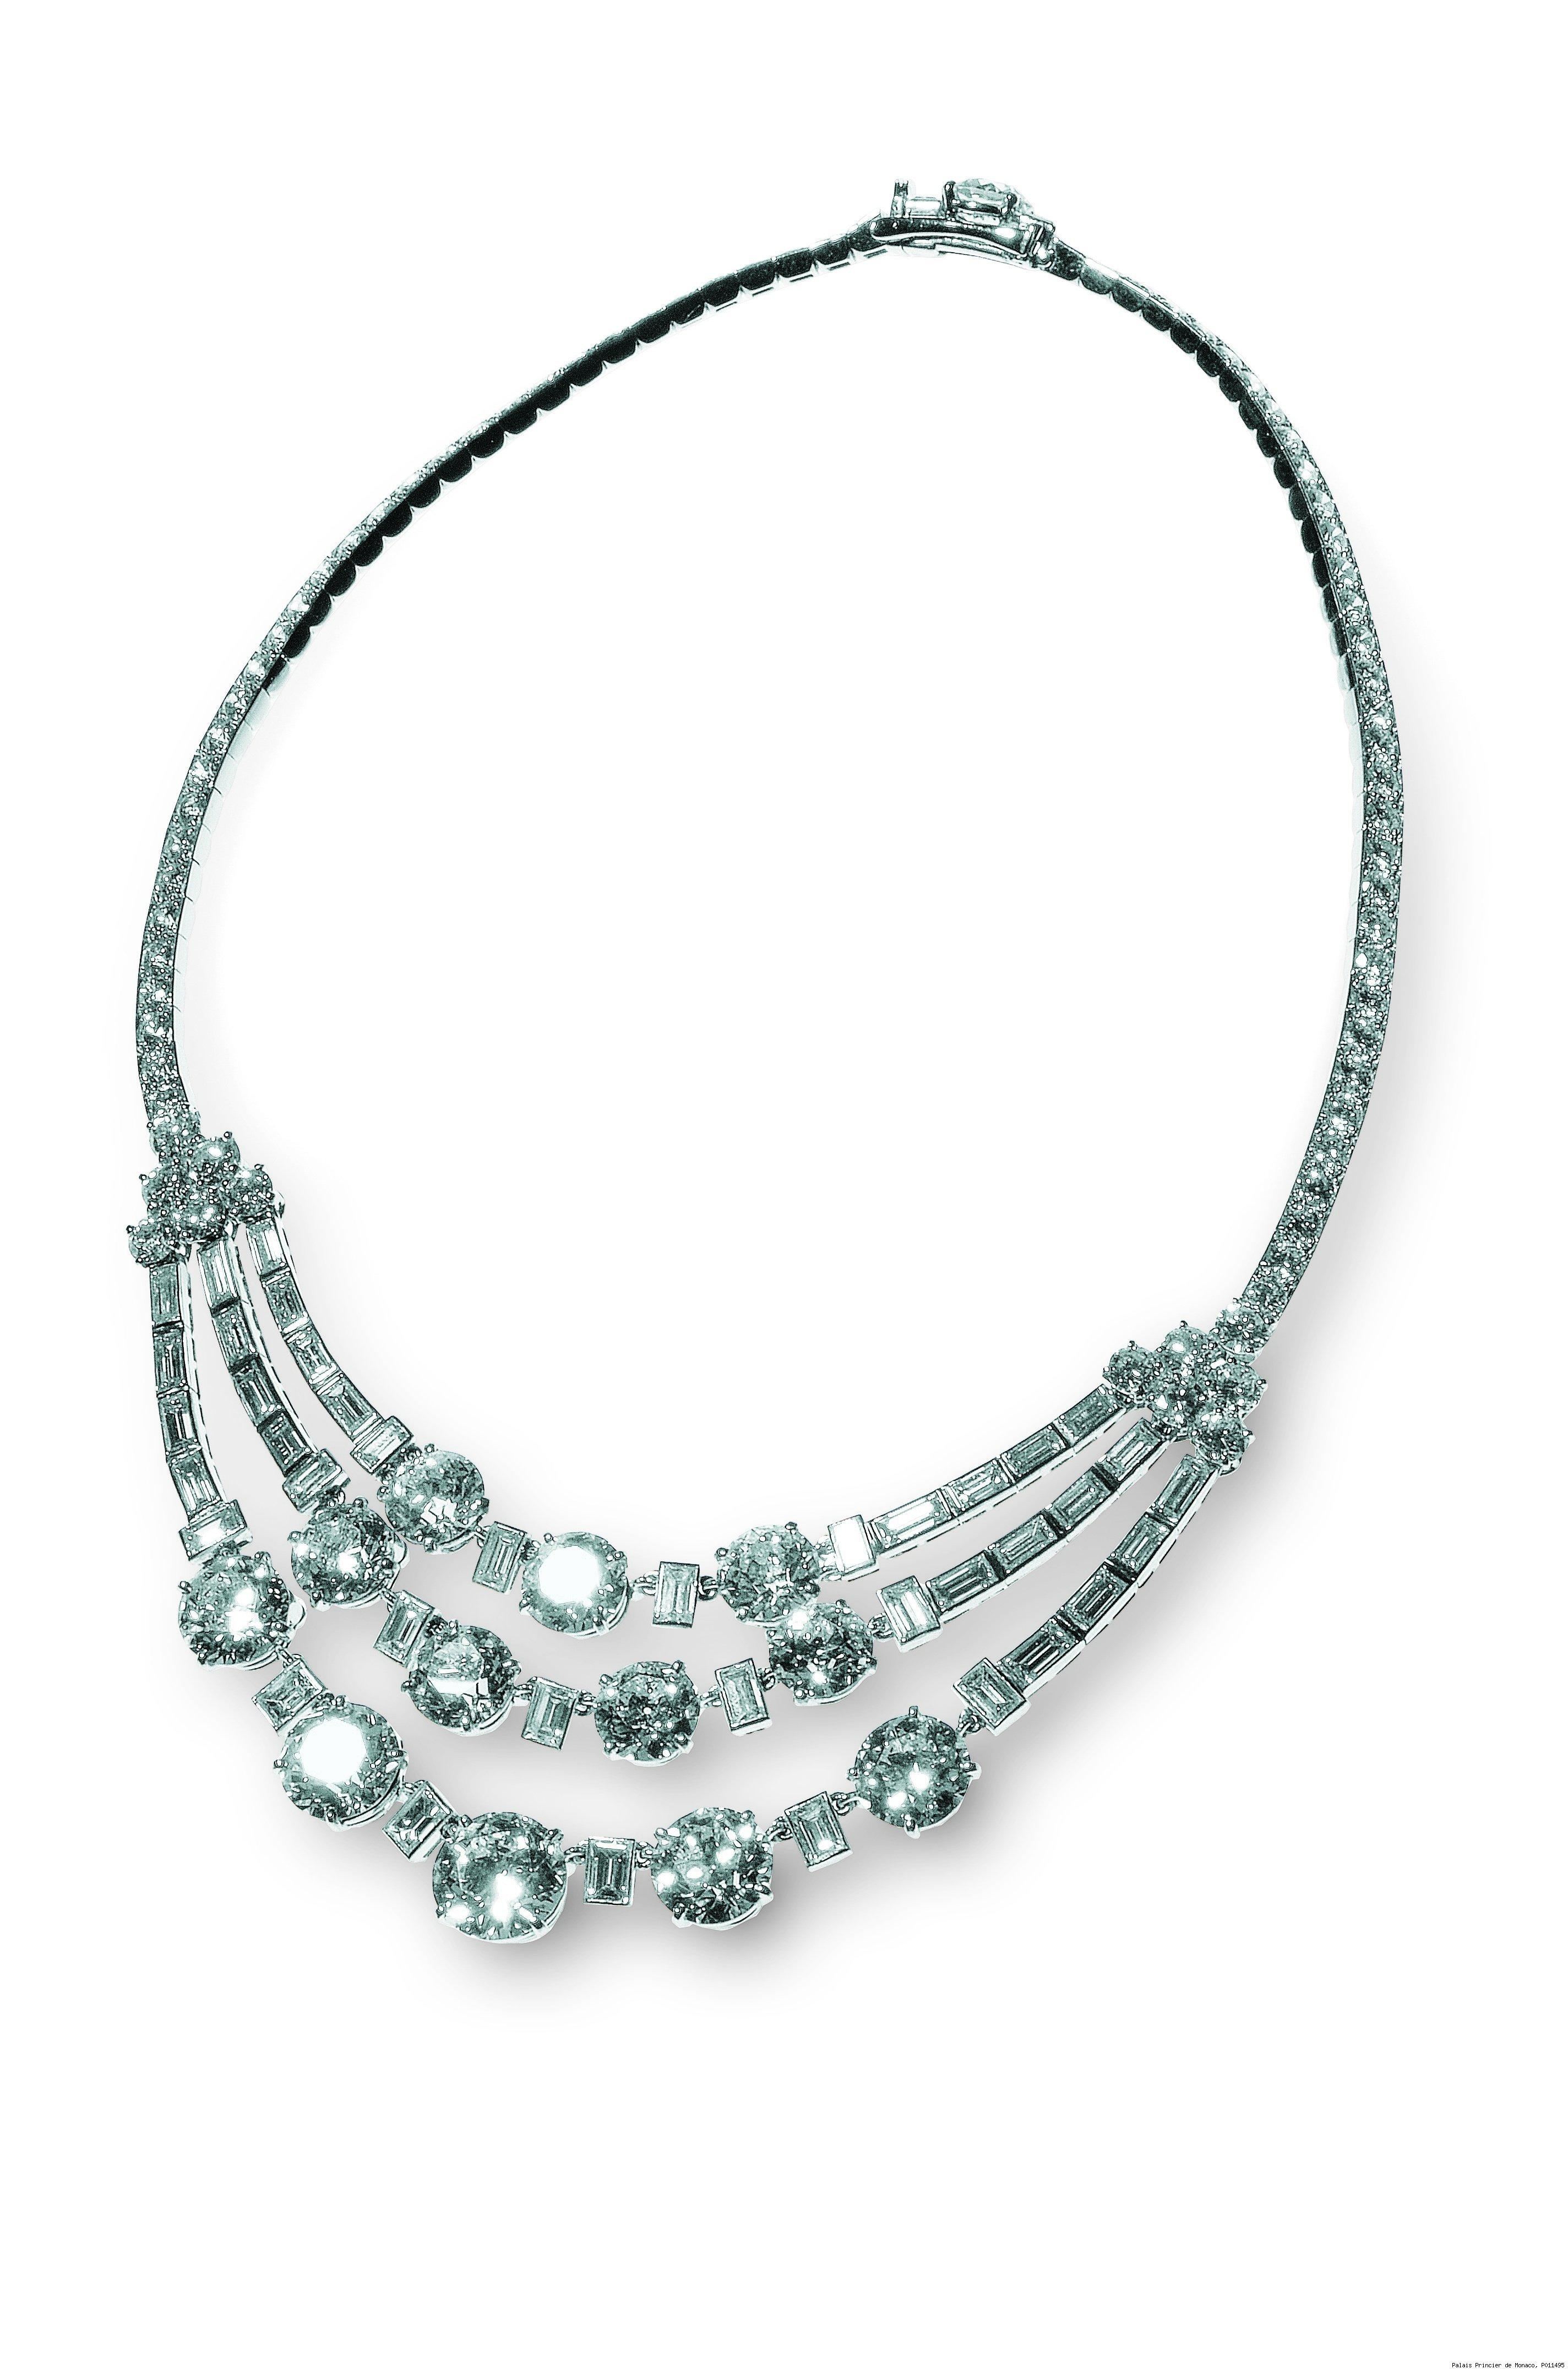 Cartier, Paris, Riviere Diamond Necklace, 1953, diamonds and platinum. H.S.H. Prince Albert II of Monaco.